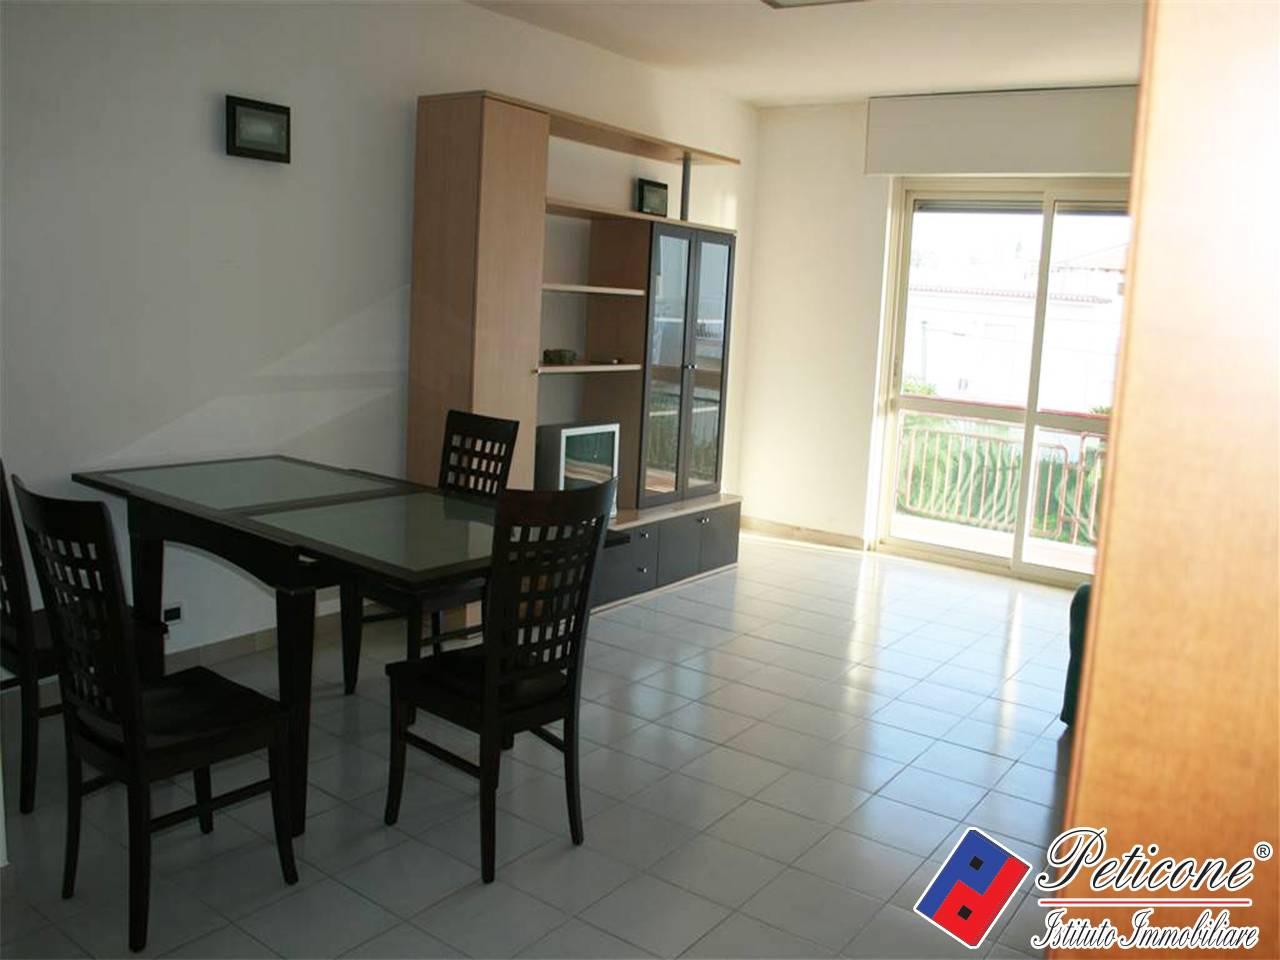 Appartamento in Vendita a Gaeta: 4 locali, 91 mq - Foto 2